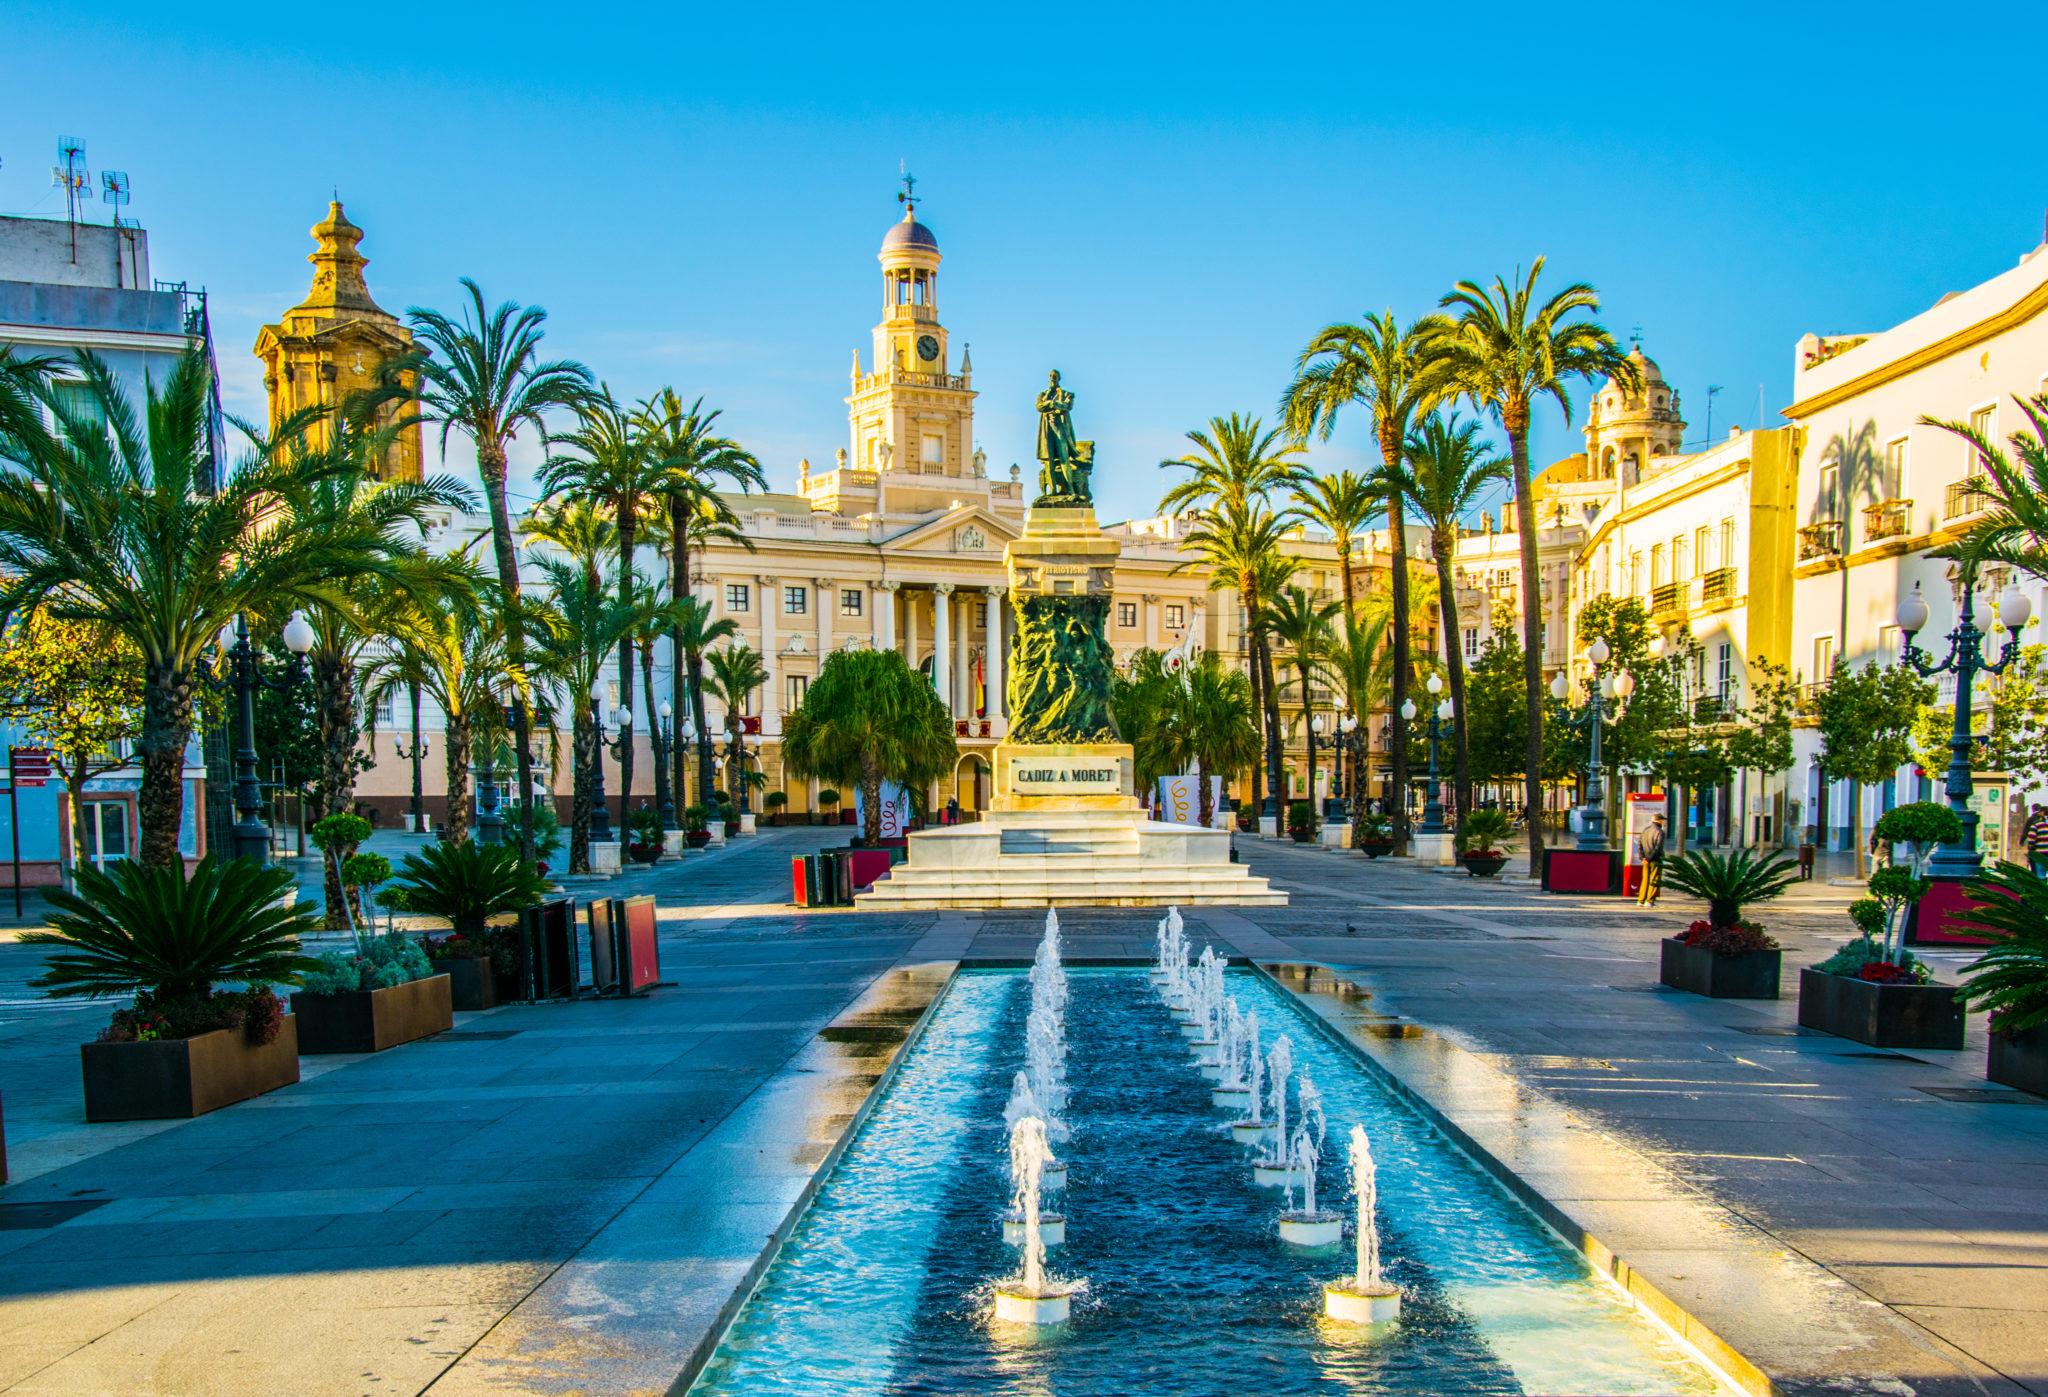 Plaza San Juan de Dios und das Rathaus in Cádiz